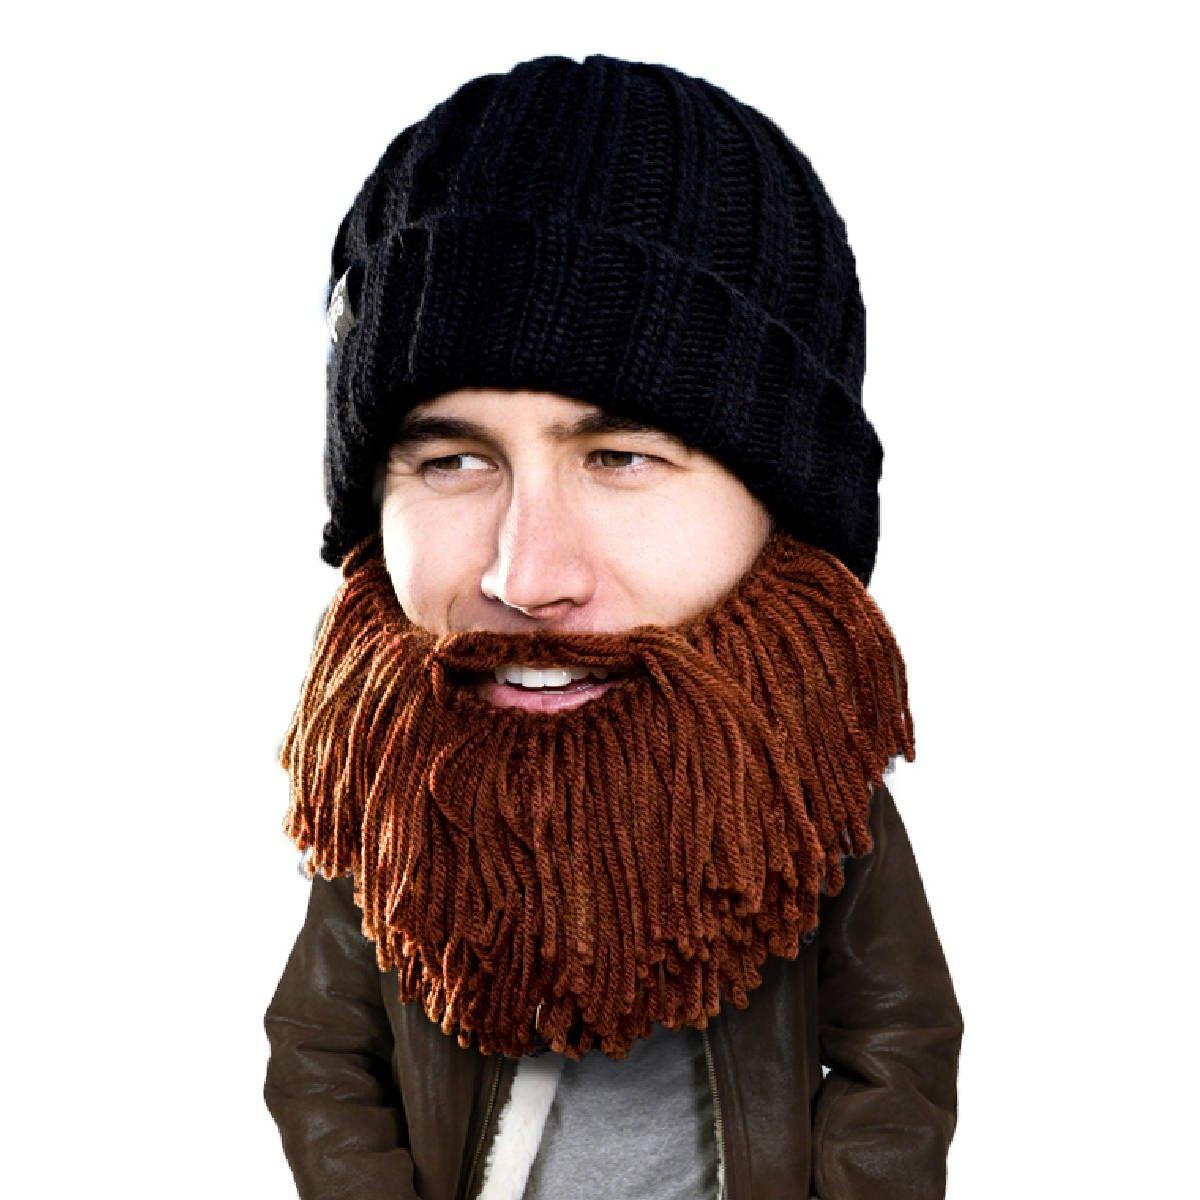 Barbarian Vagabond Beard Head knit beanie with beard! Makes a great ...